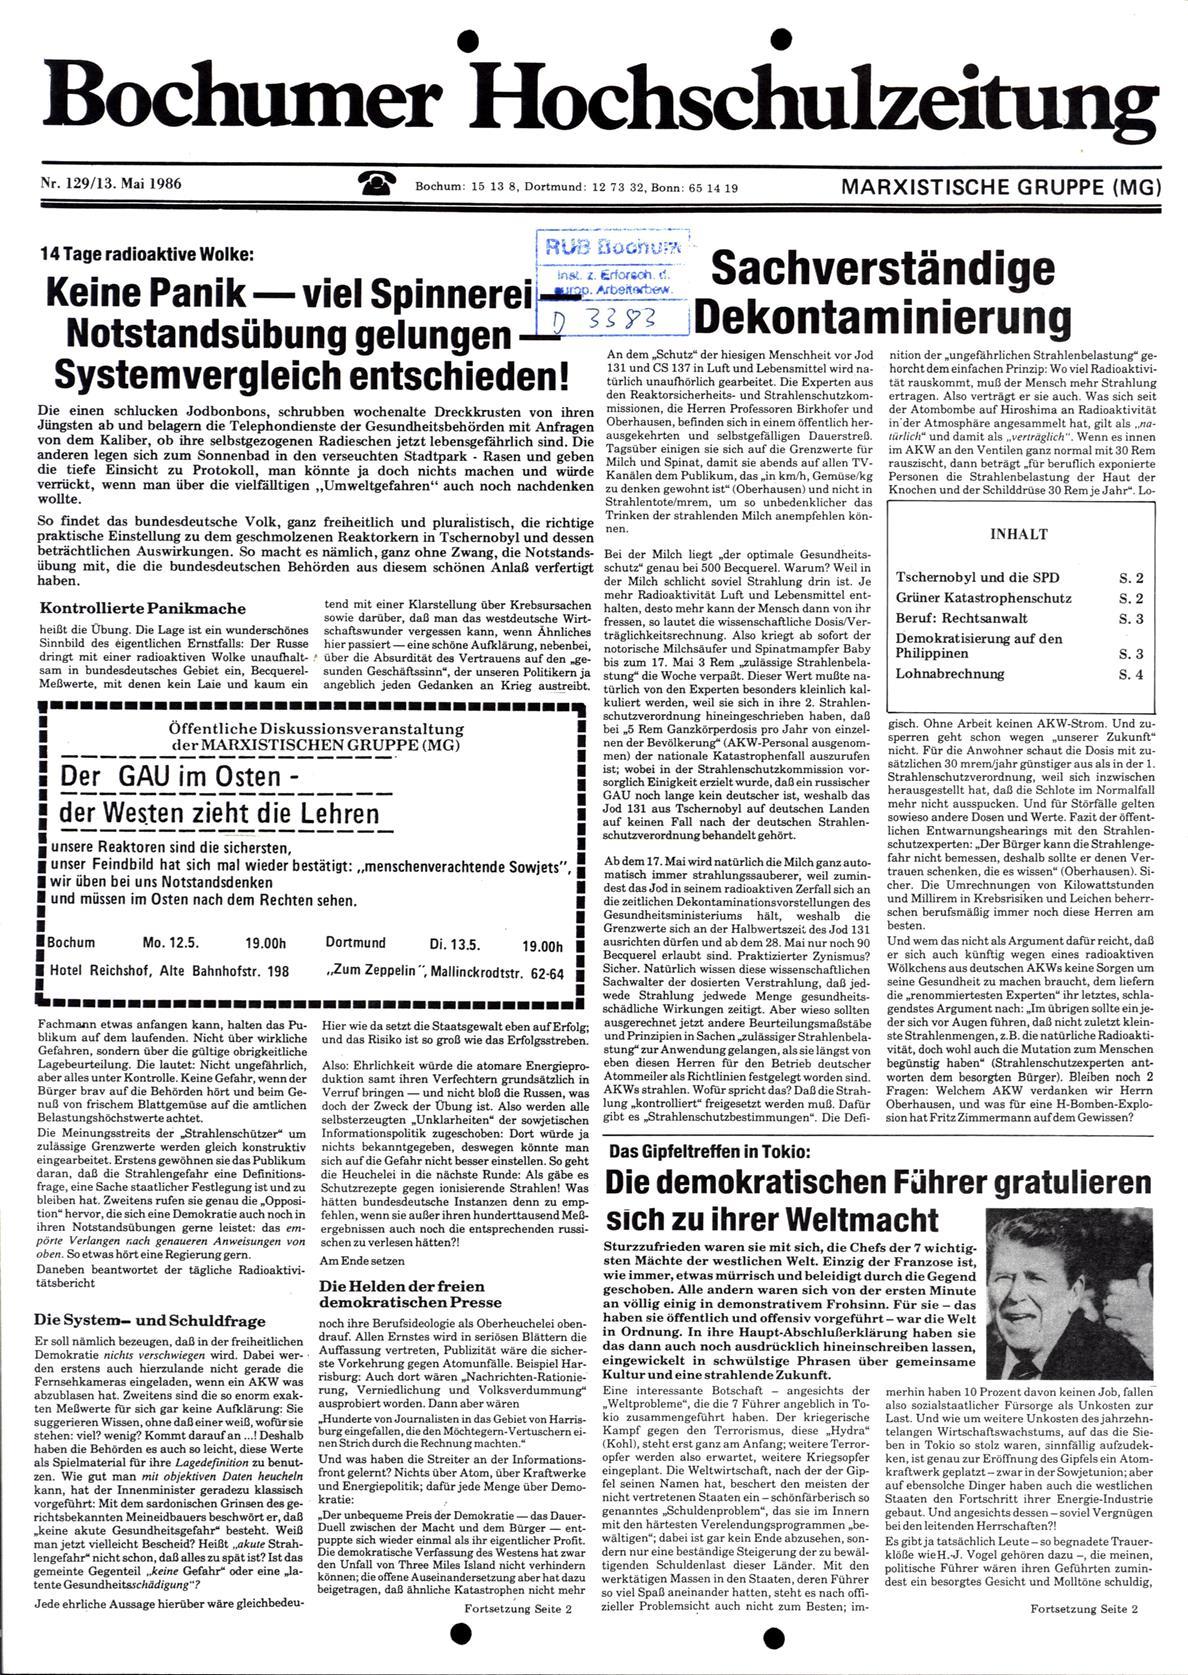 Bochum_BHZ_19860513_129_001